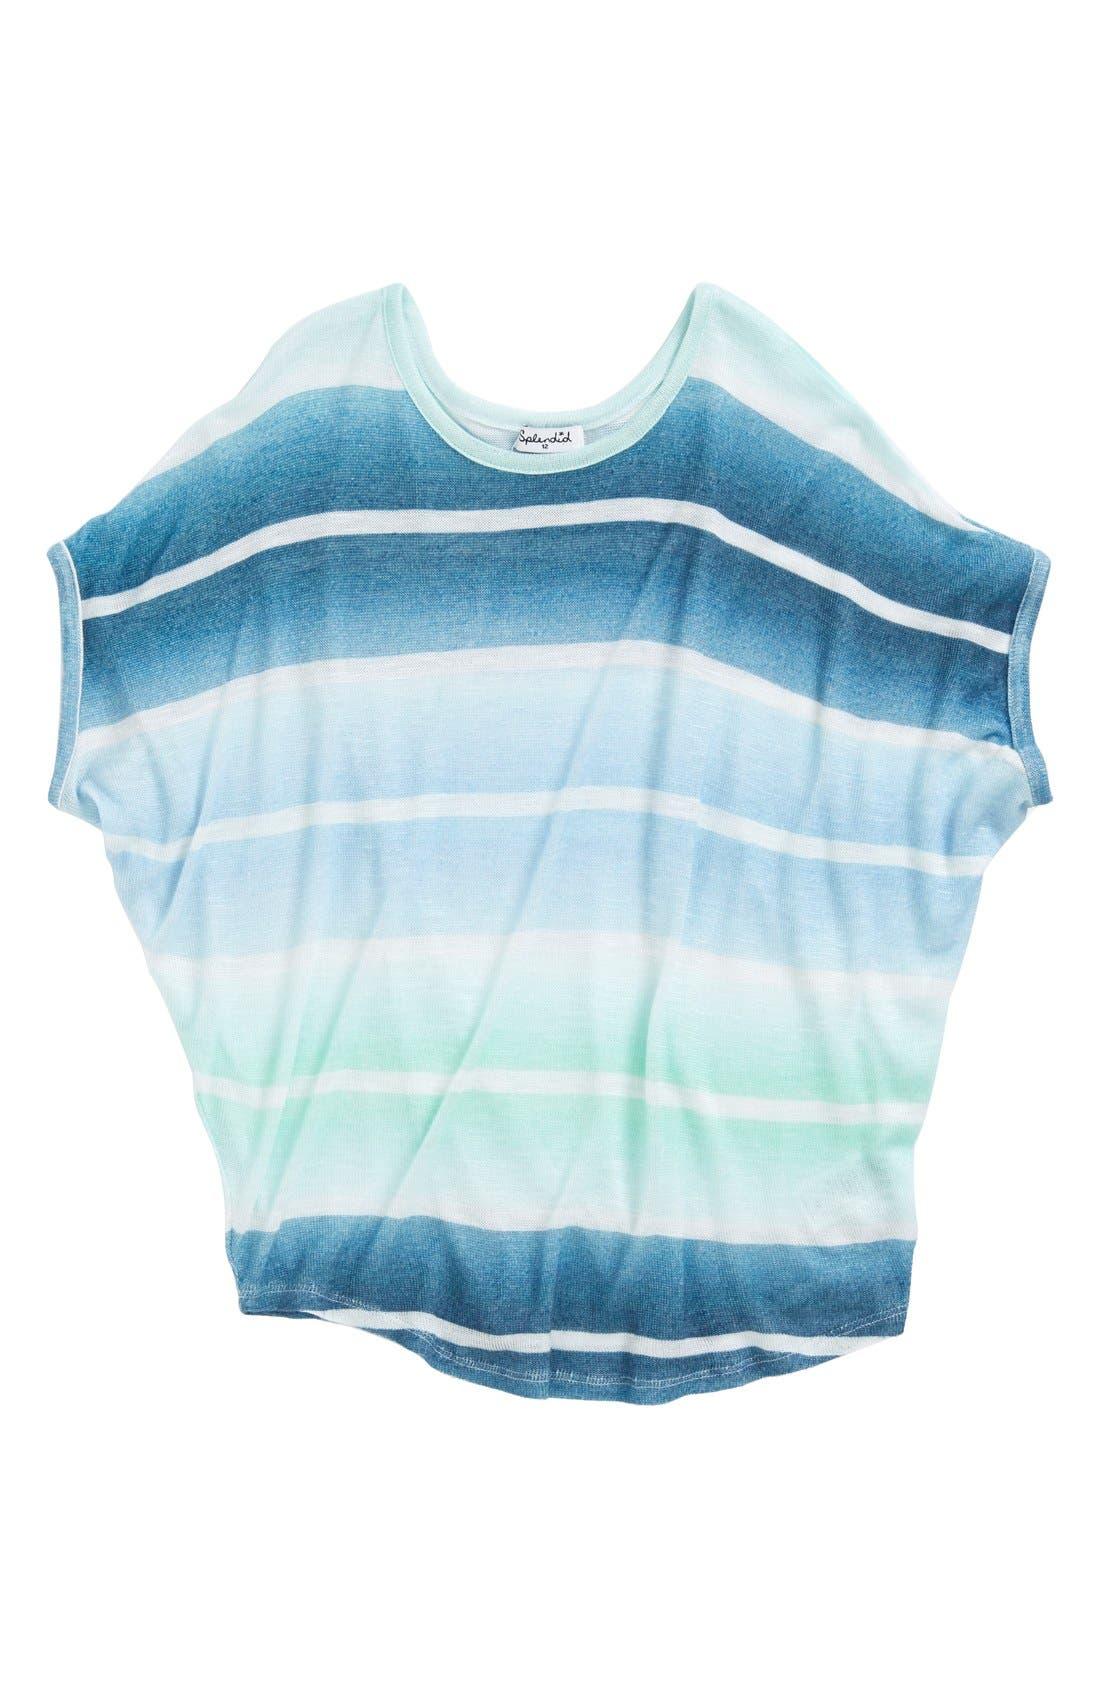 Alternate Image 1 Selected - Splendid Oversize Dolman Sleeve Stripe Top (Big Girls)